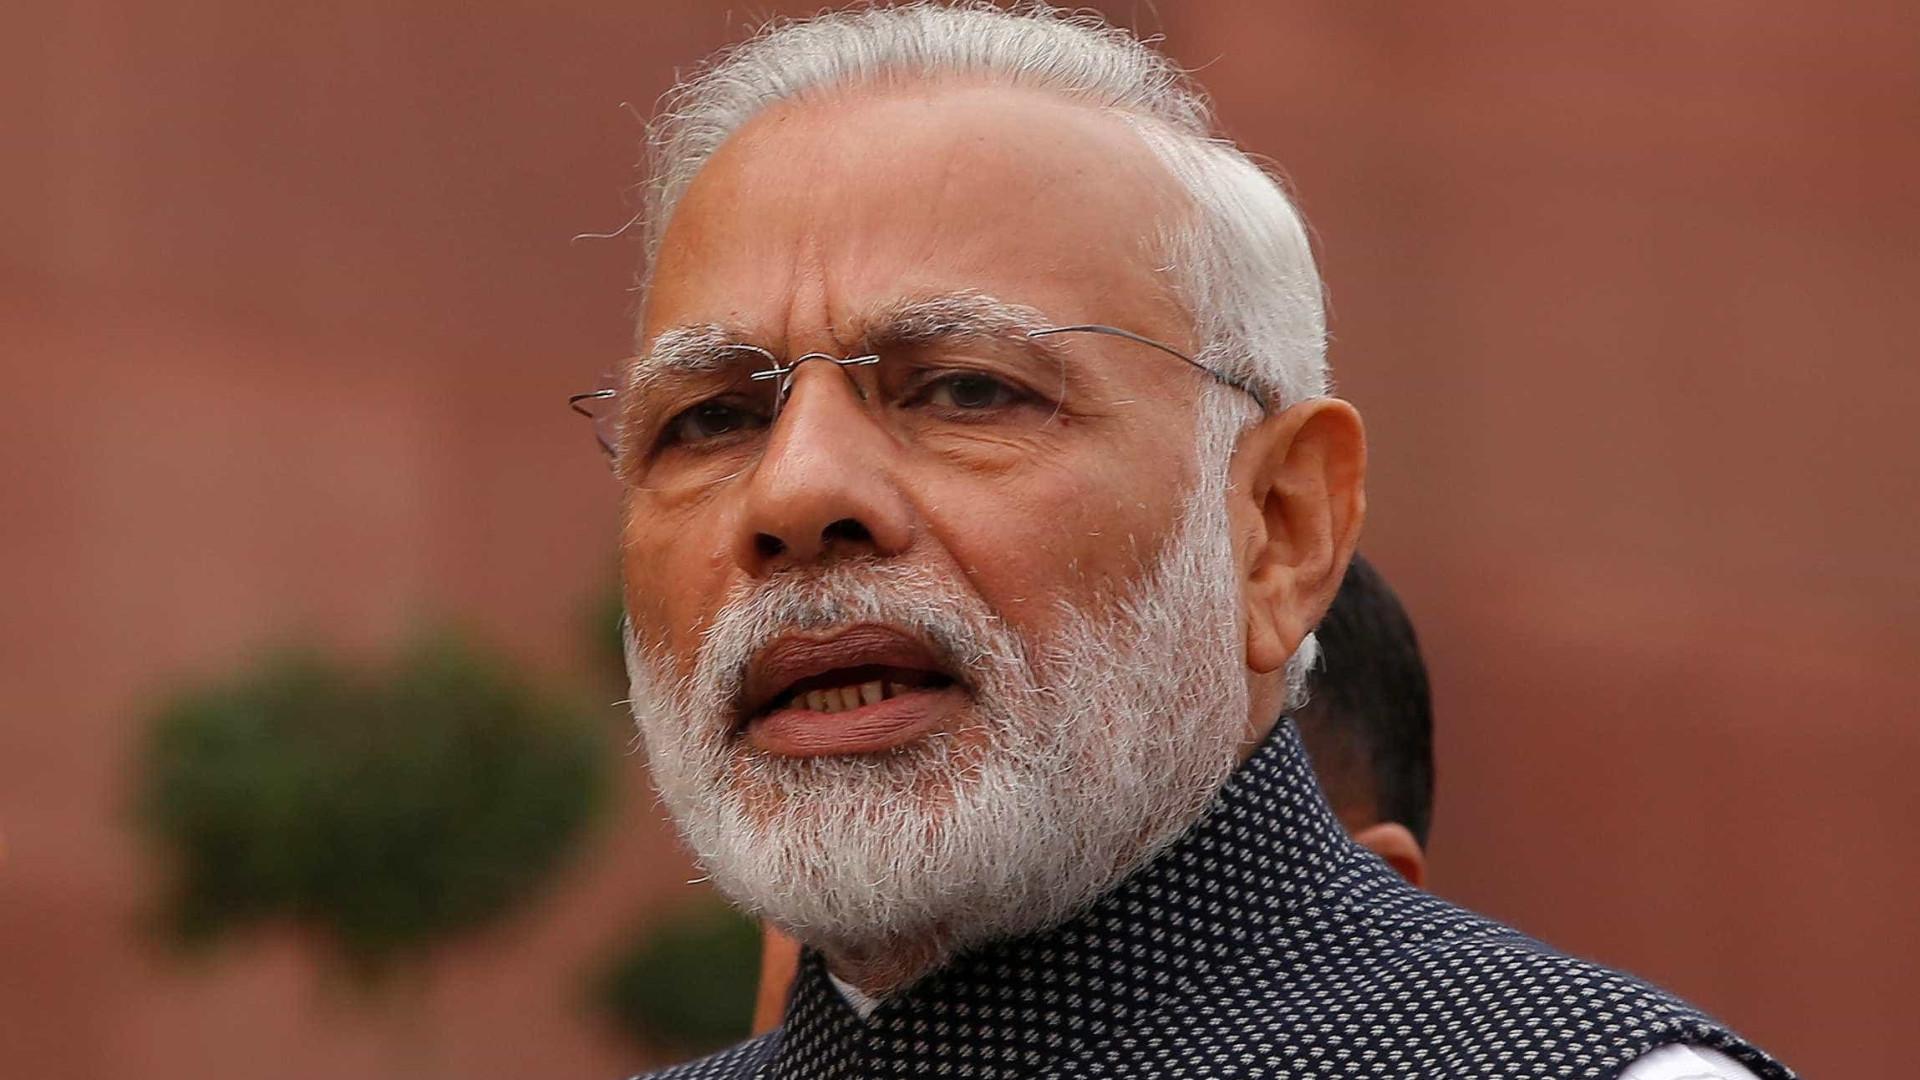 Primeiro-ministro da Índia de visita a Portugal expressa condolências